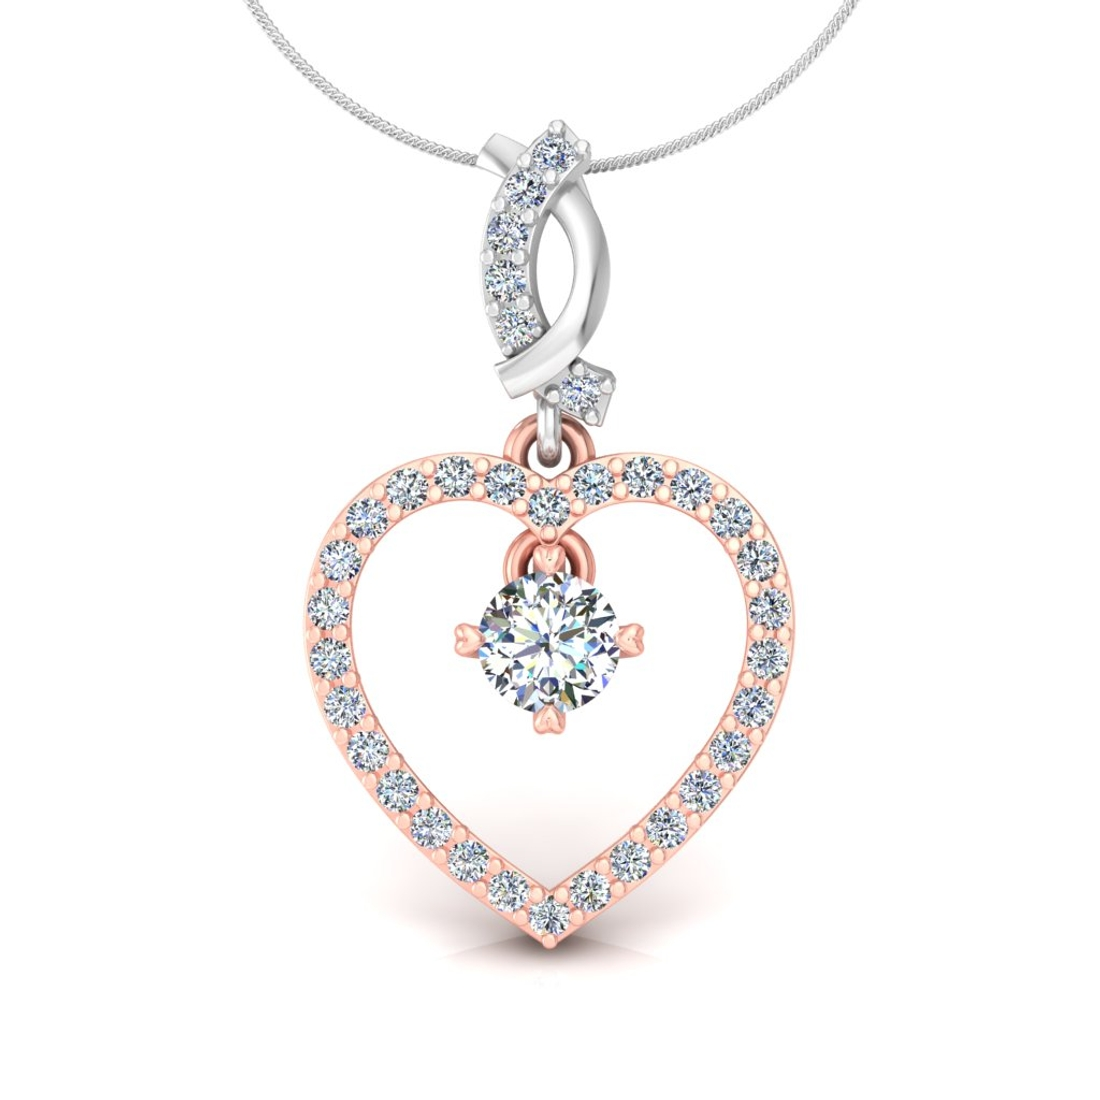 Glow heart pendant